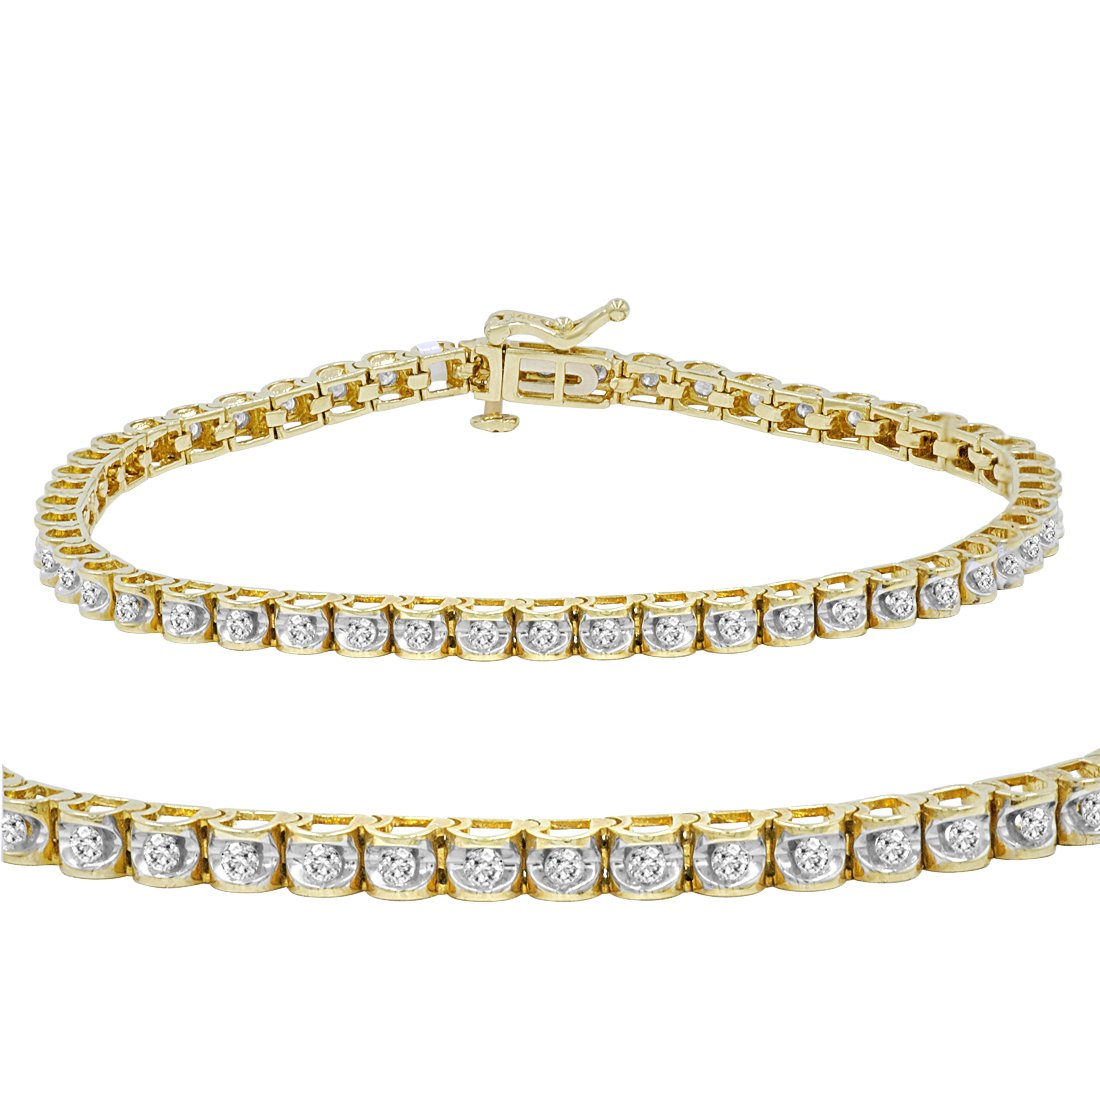 AGS Certified 1 ct tw Diamond Tennis Bracelet in 14K Yellow Gold 7 inch